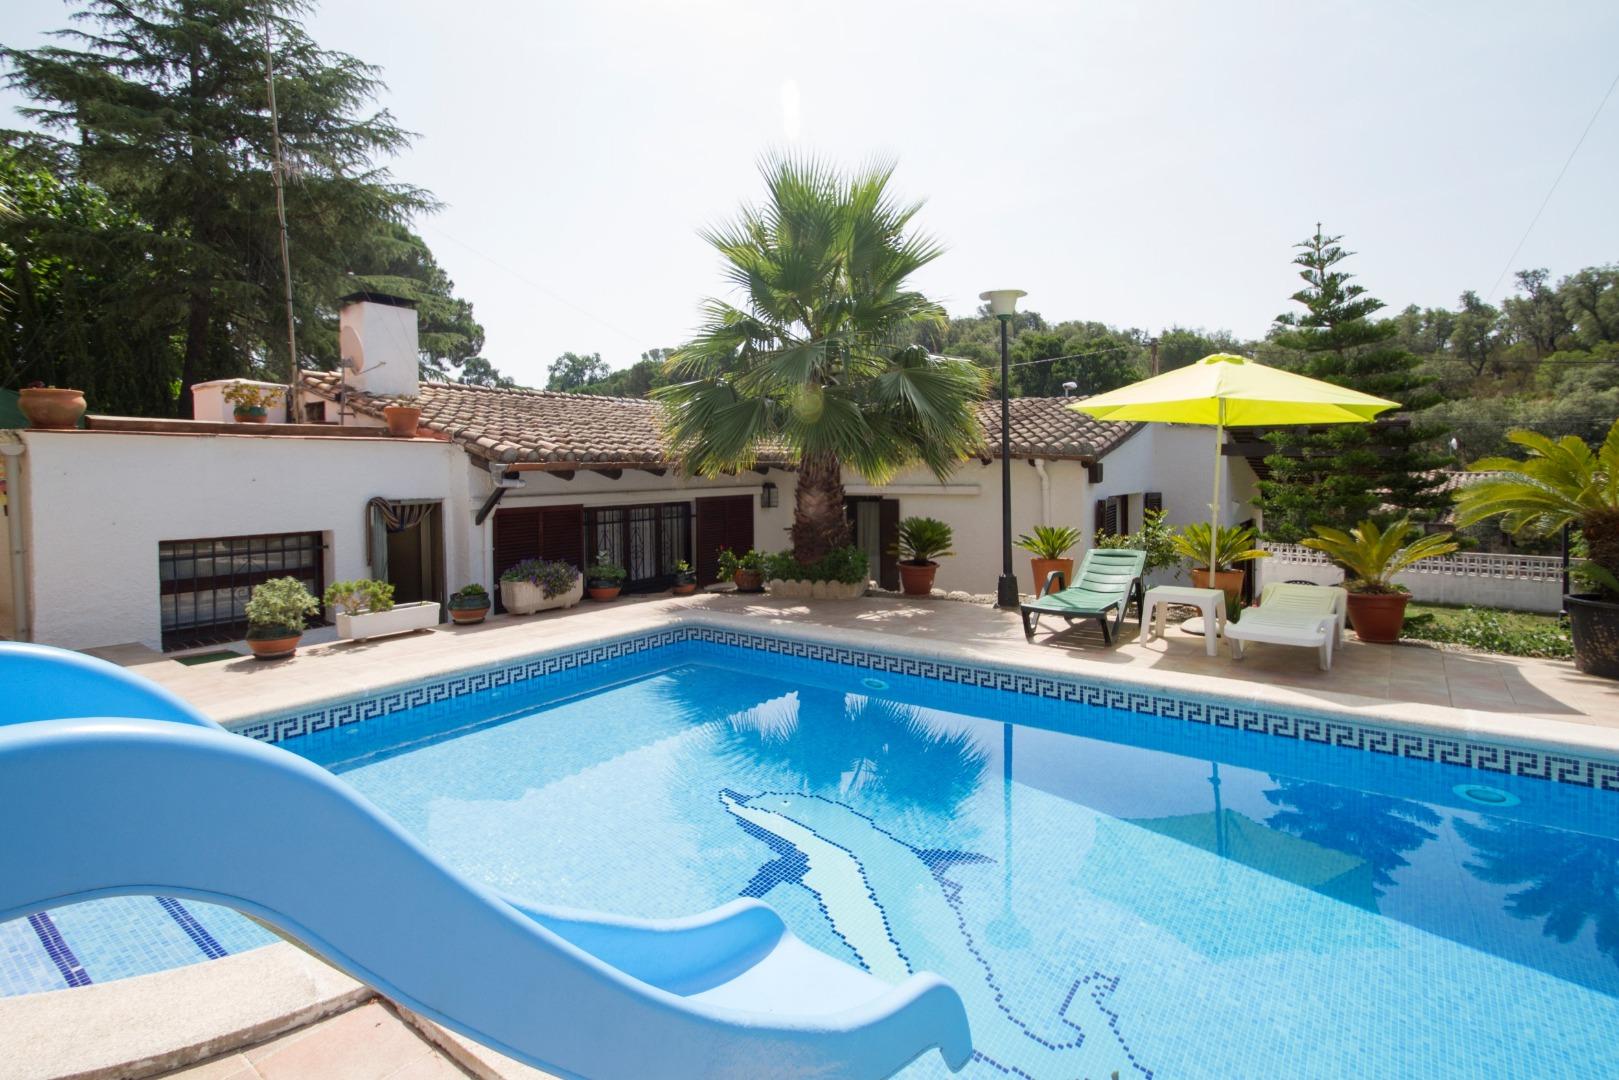 Villa Nepal,Calonge,Costa Brava #1